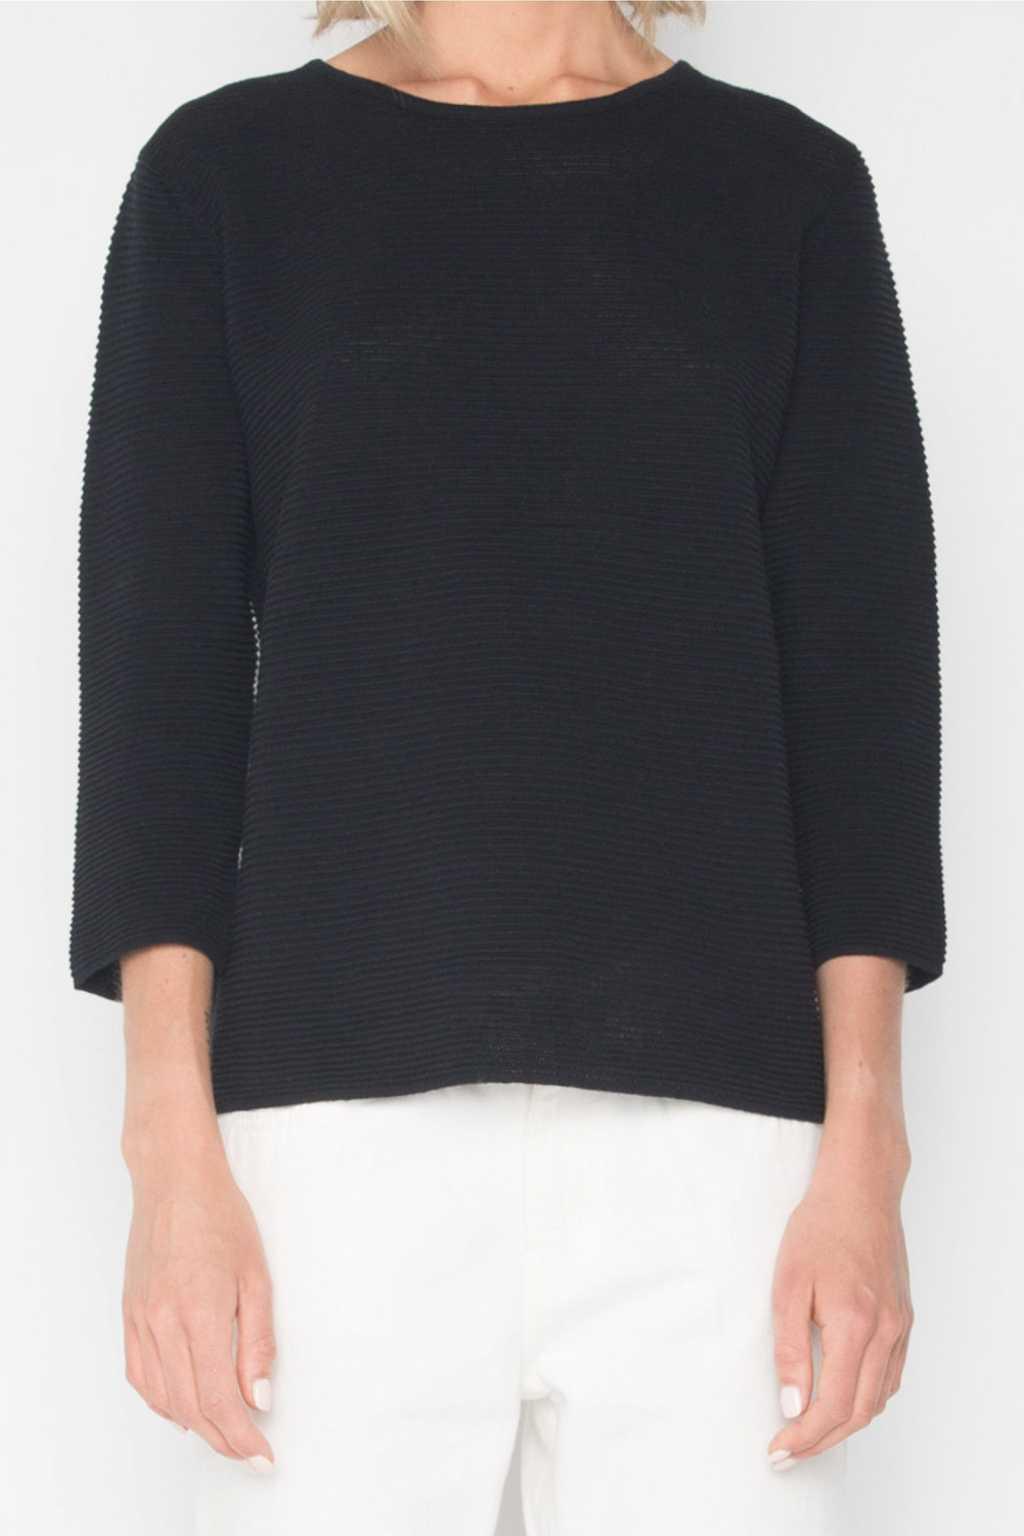 Sweater 1793 Black 2